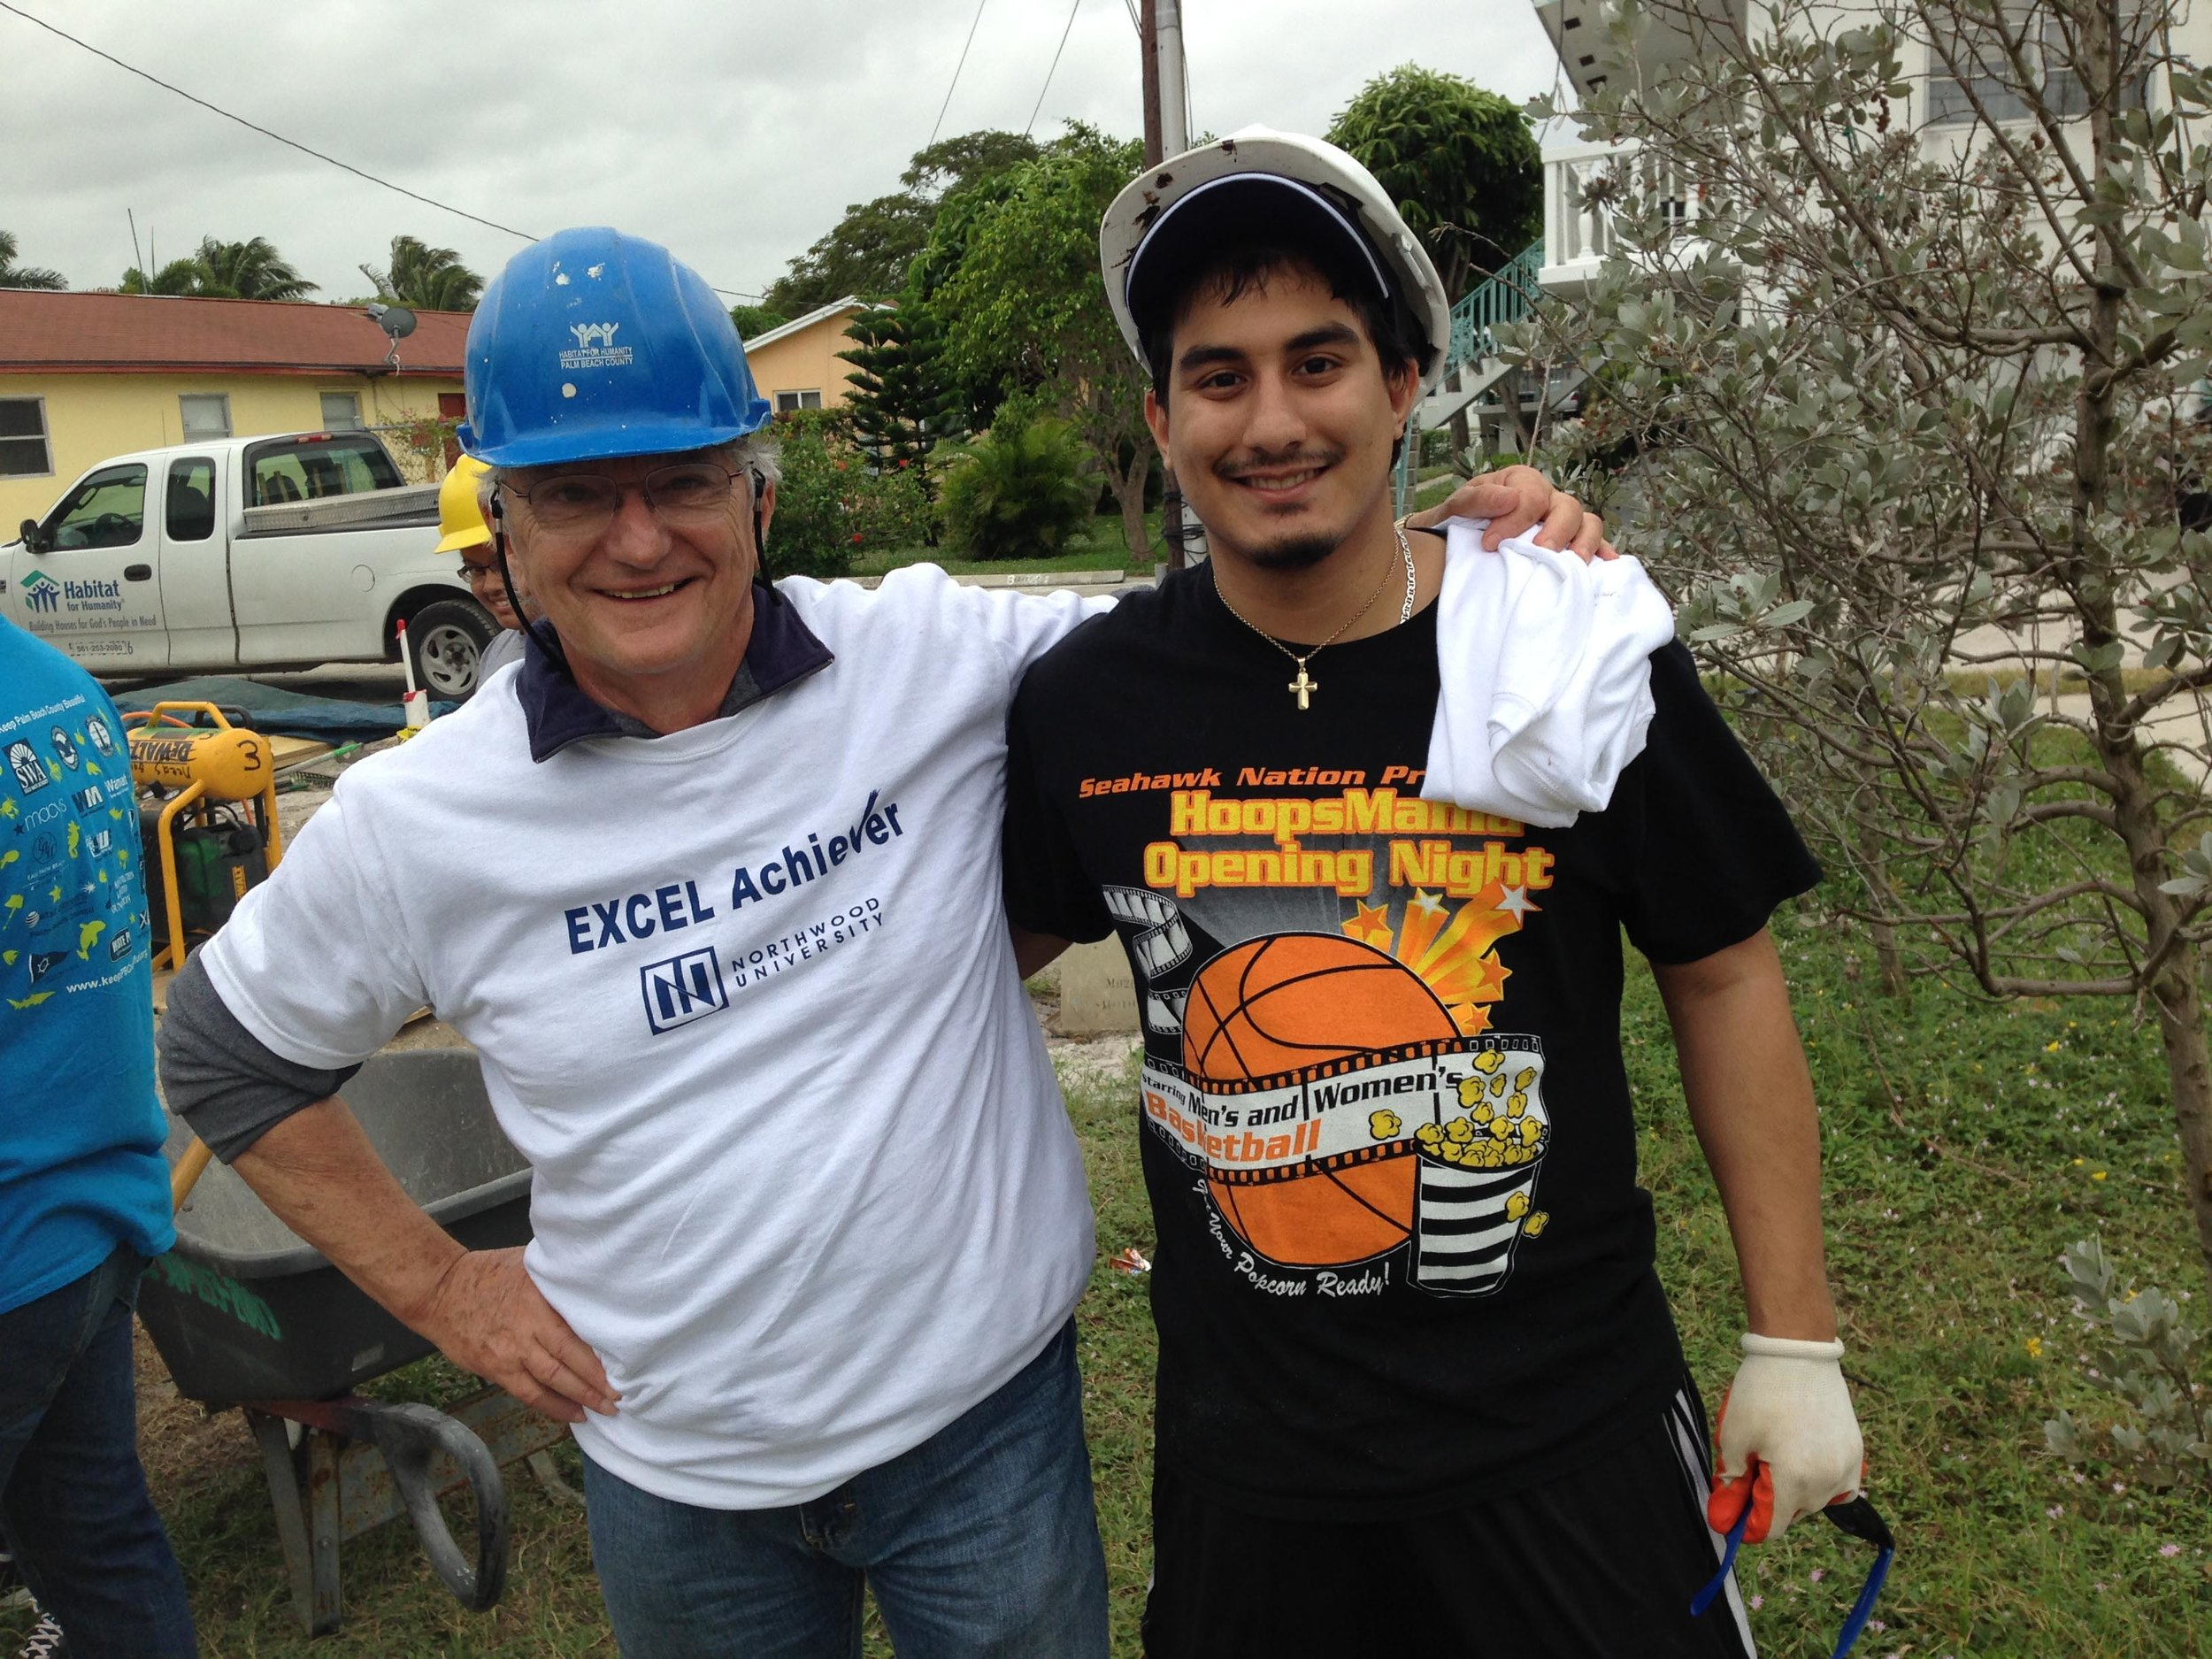 Dr. Ed Howell and Adalberto Trujillo assist Habitat for Humanity.